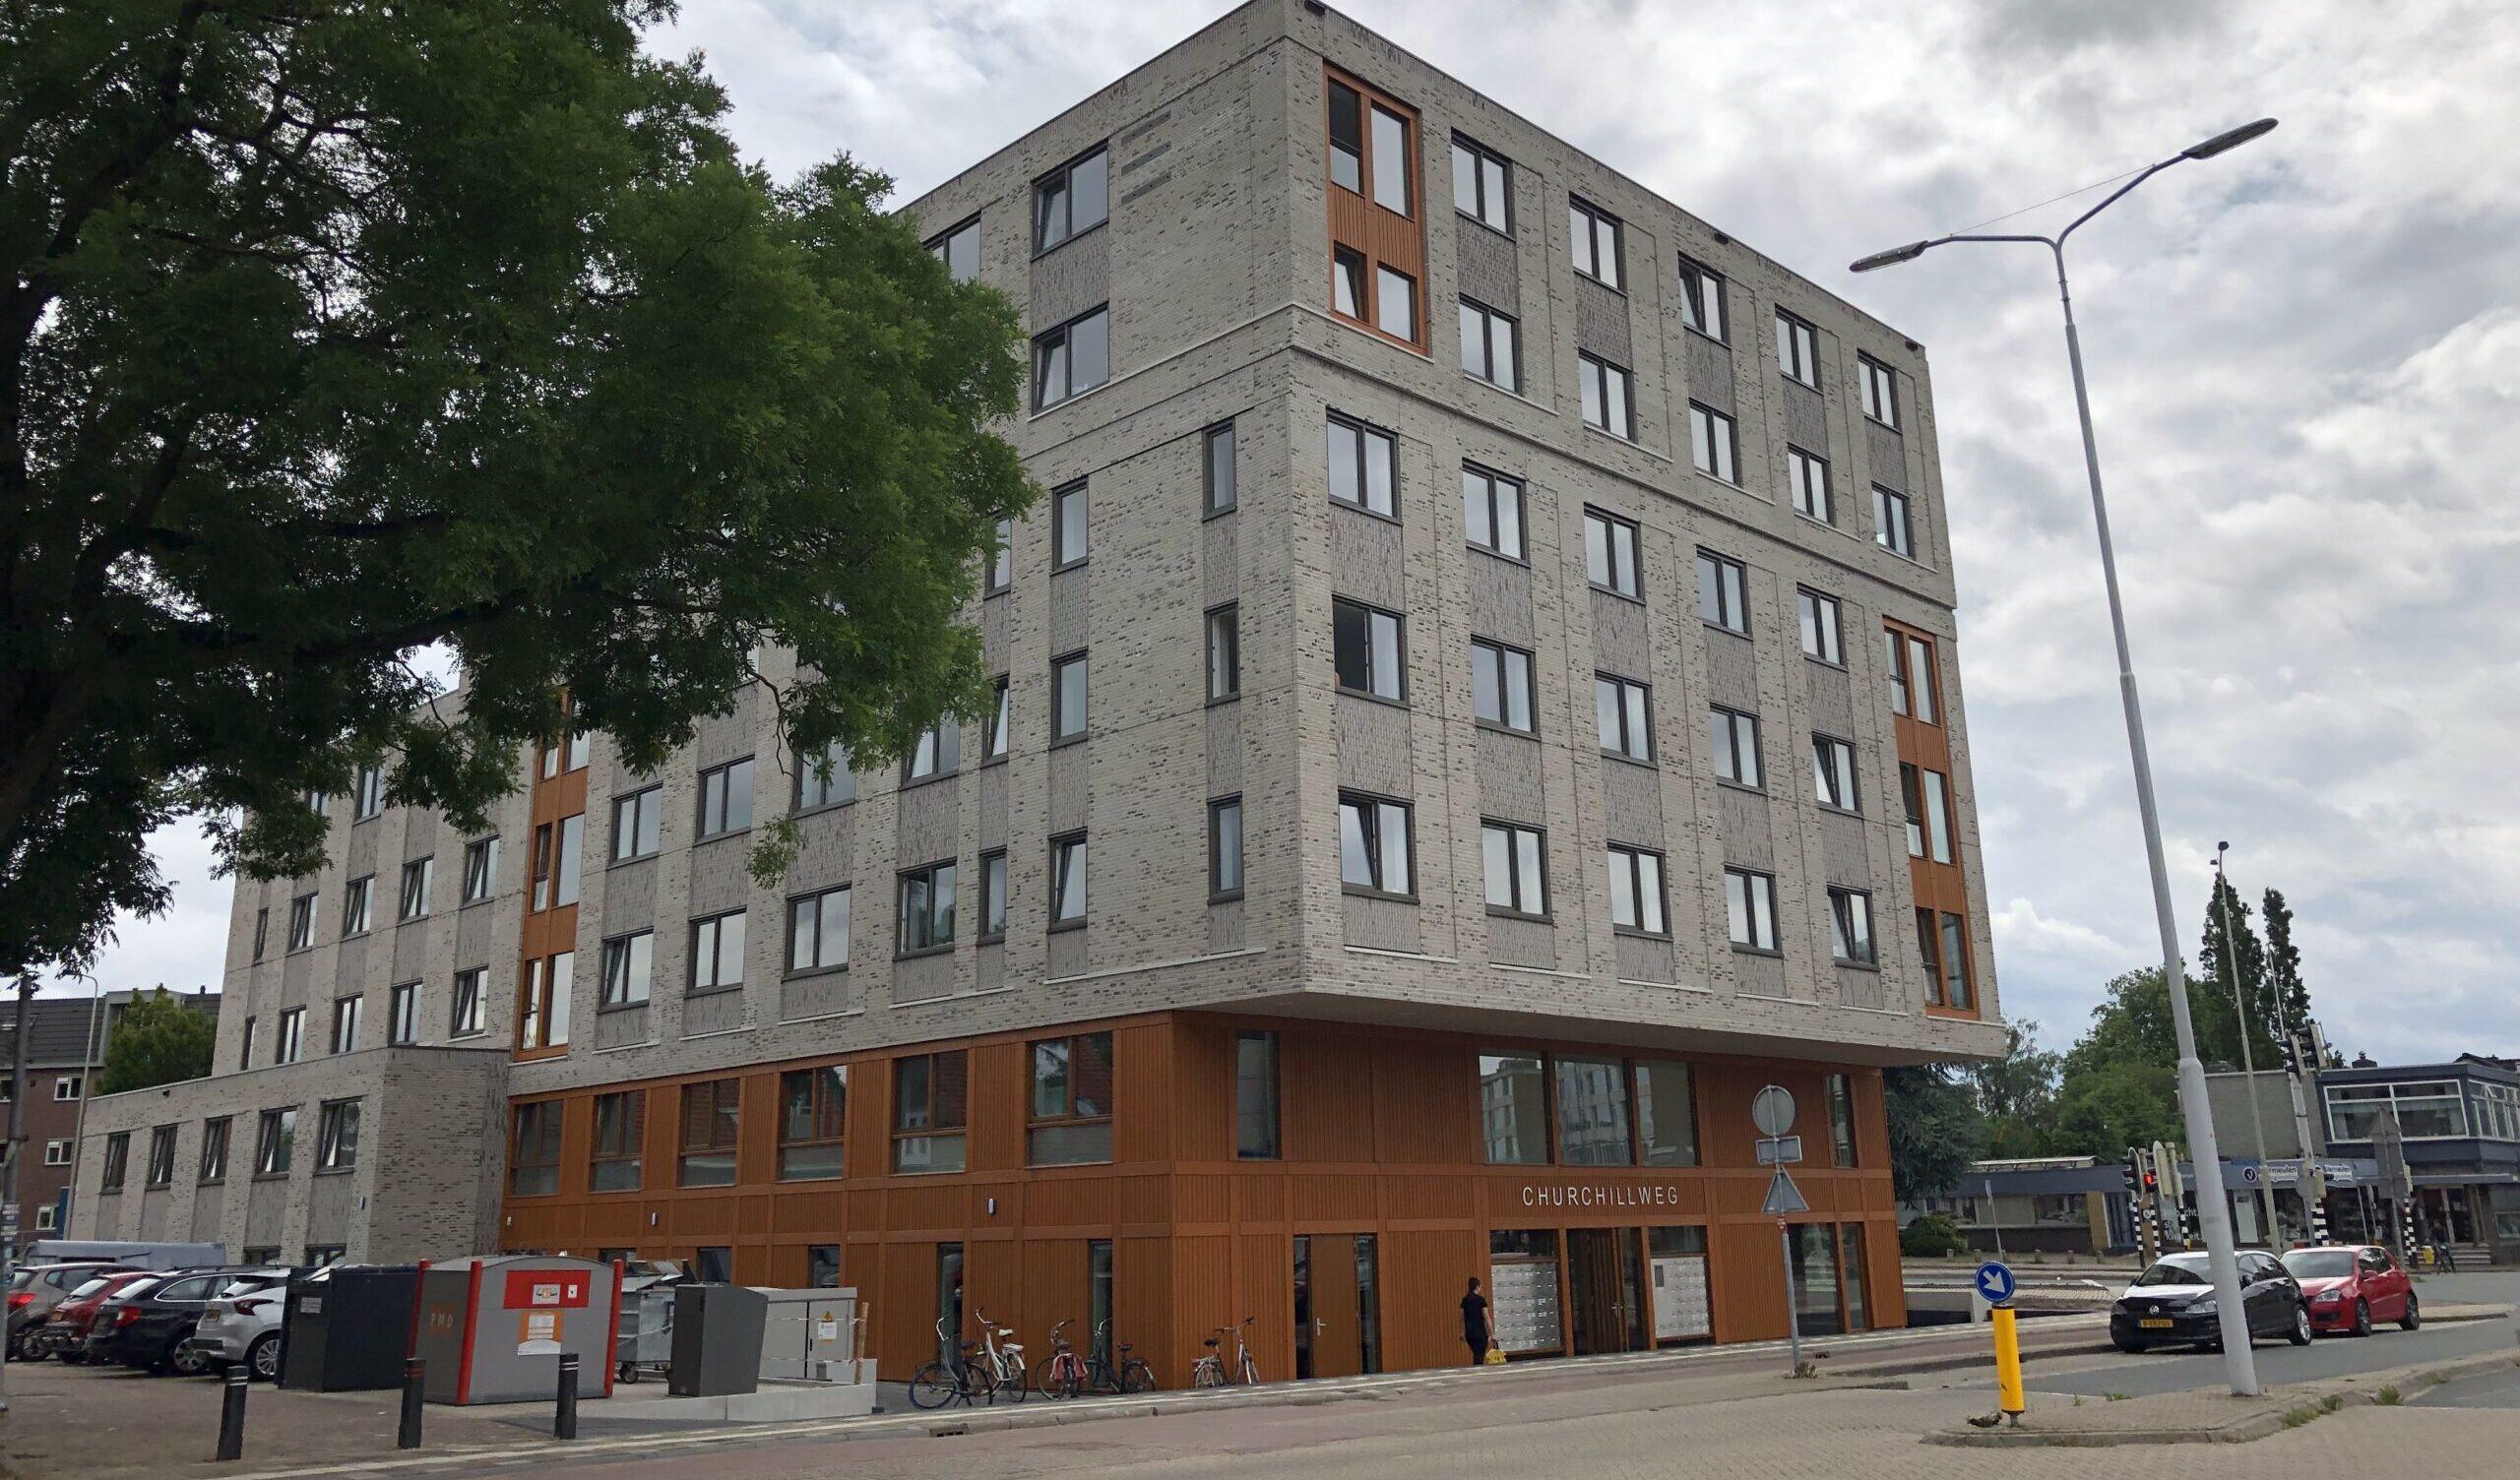 First residents in new building on Churchillweg